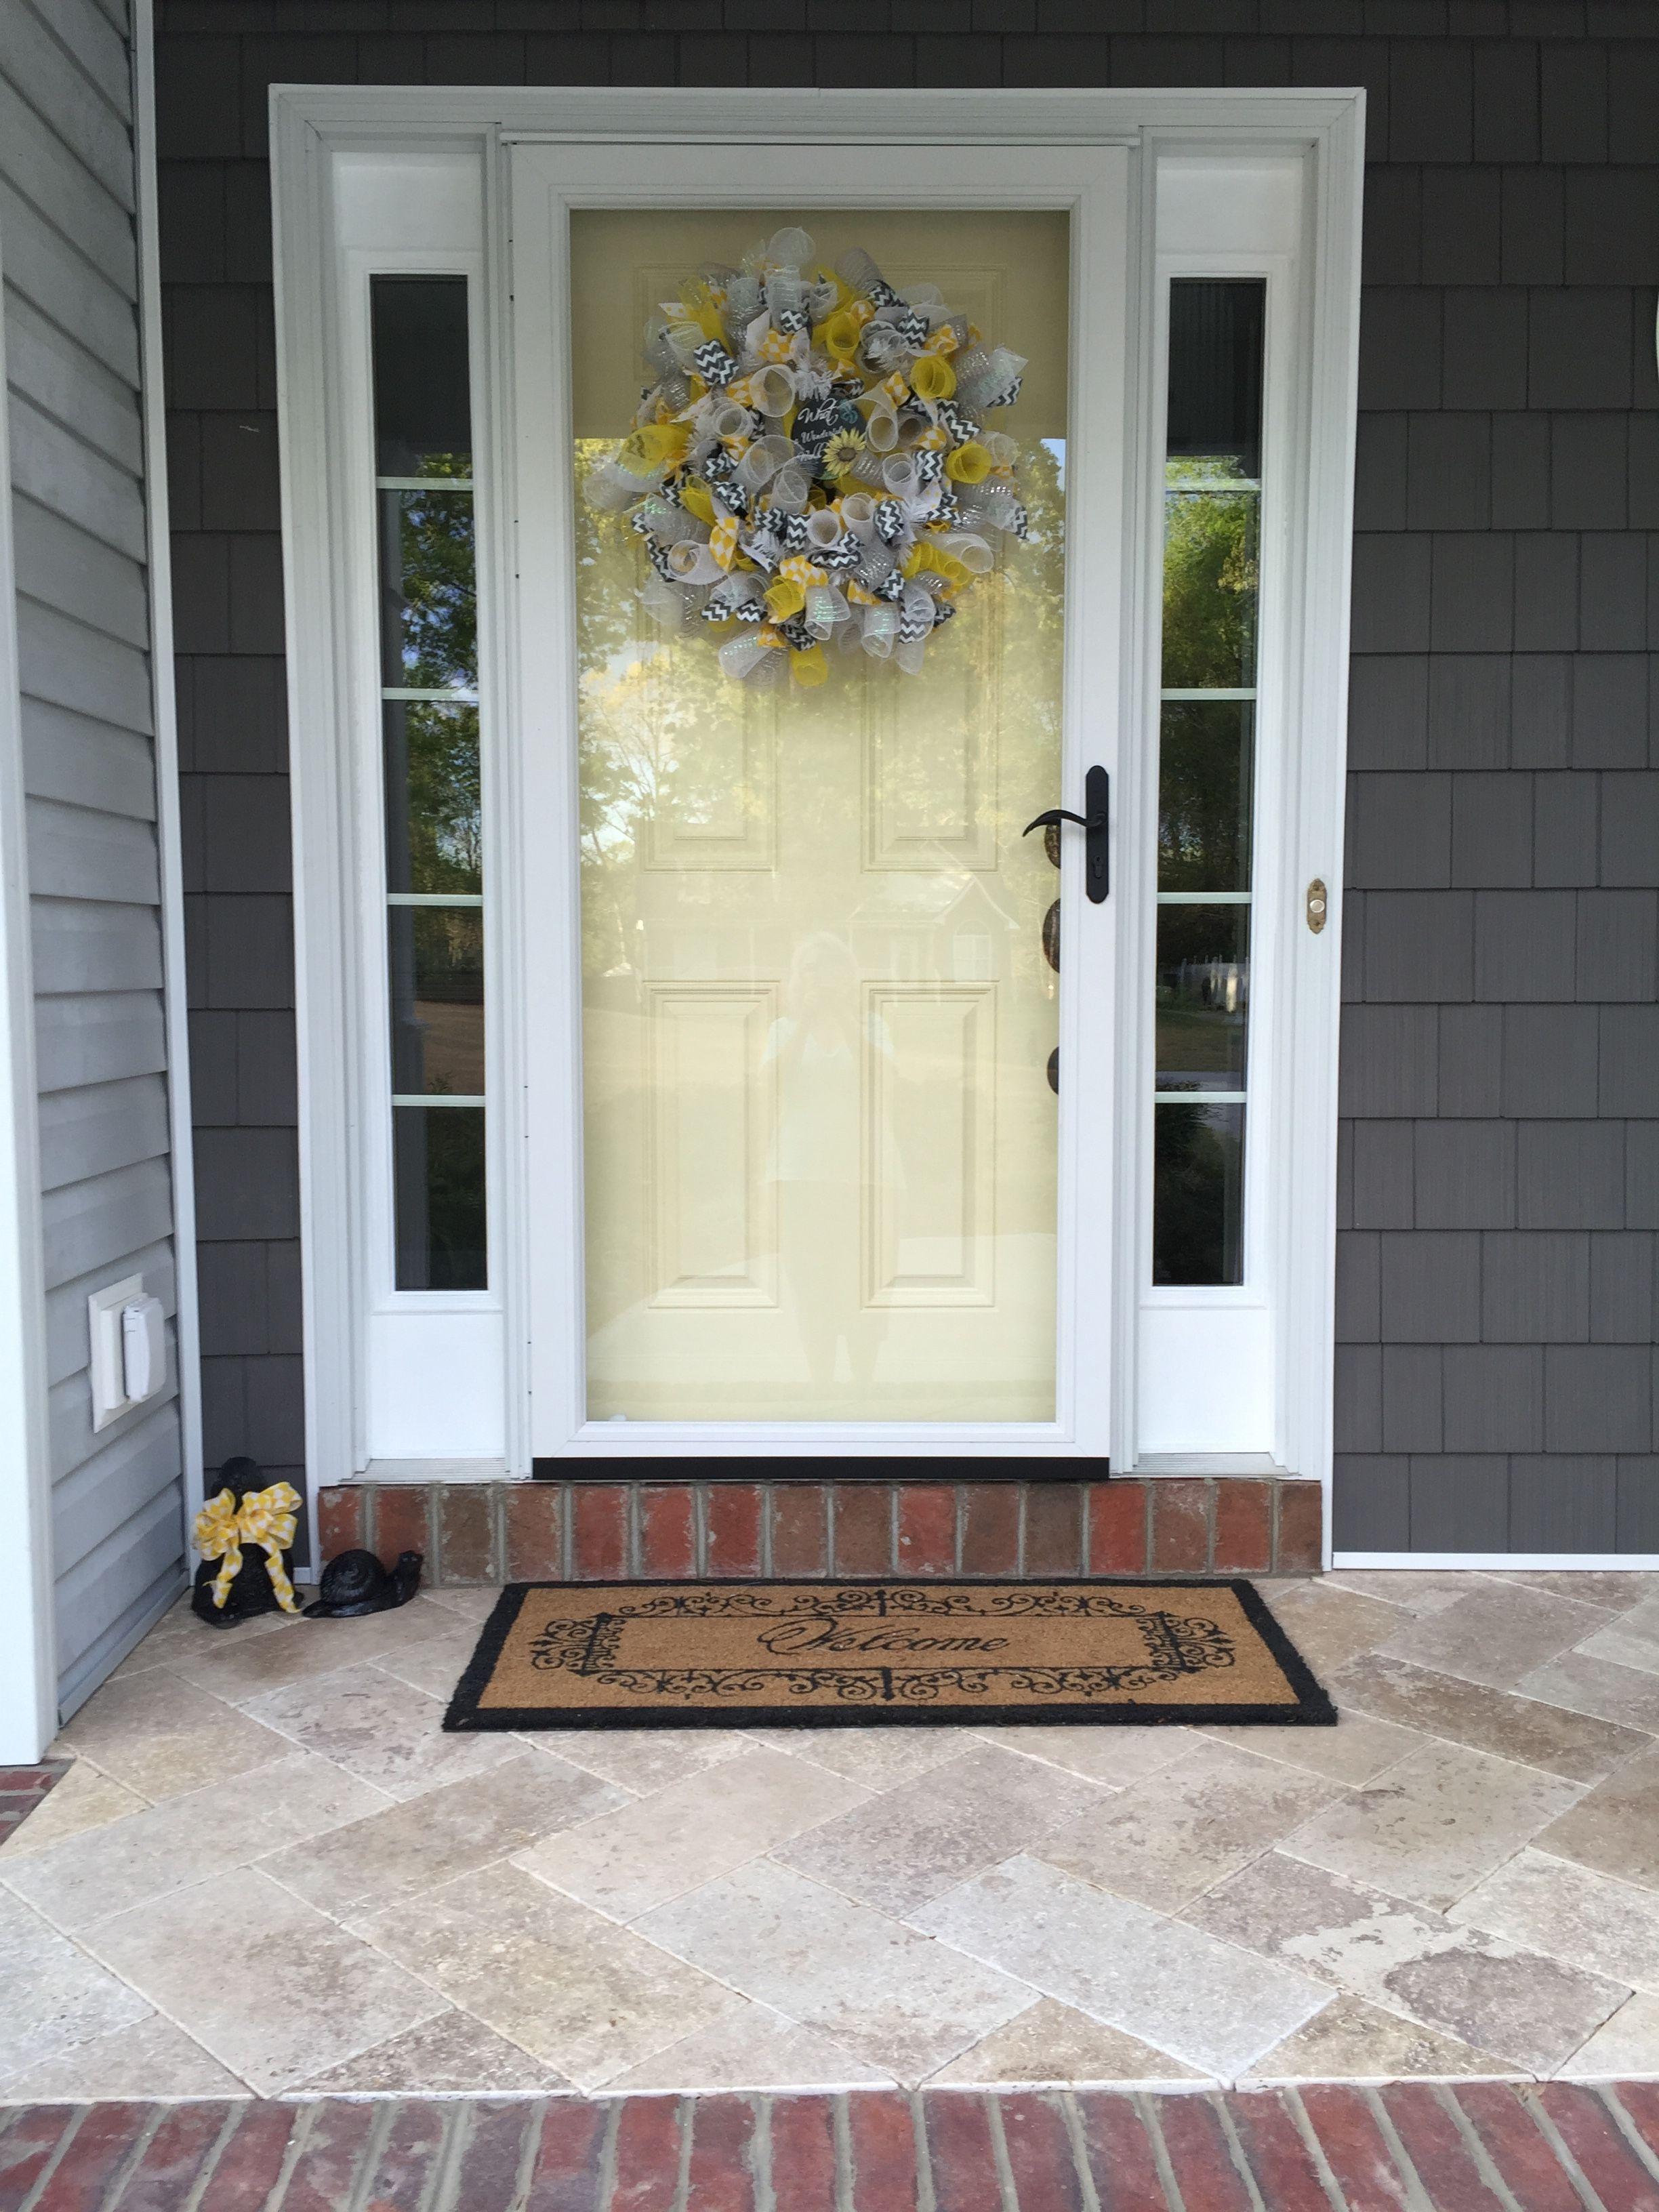 Outdoor Tile For Front Porch | Shapeyourminds.com